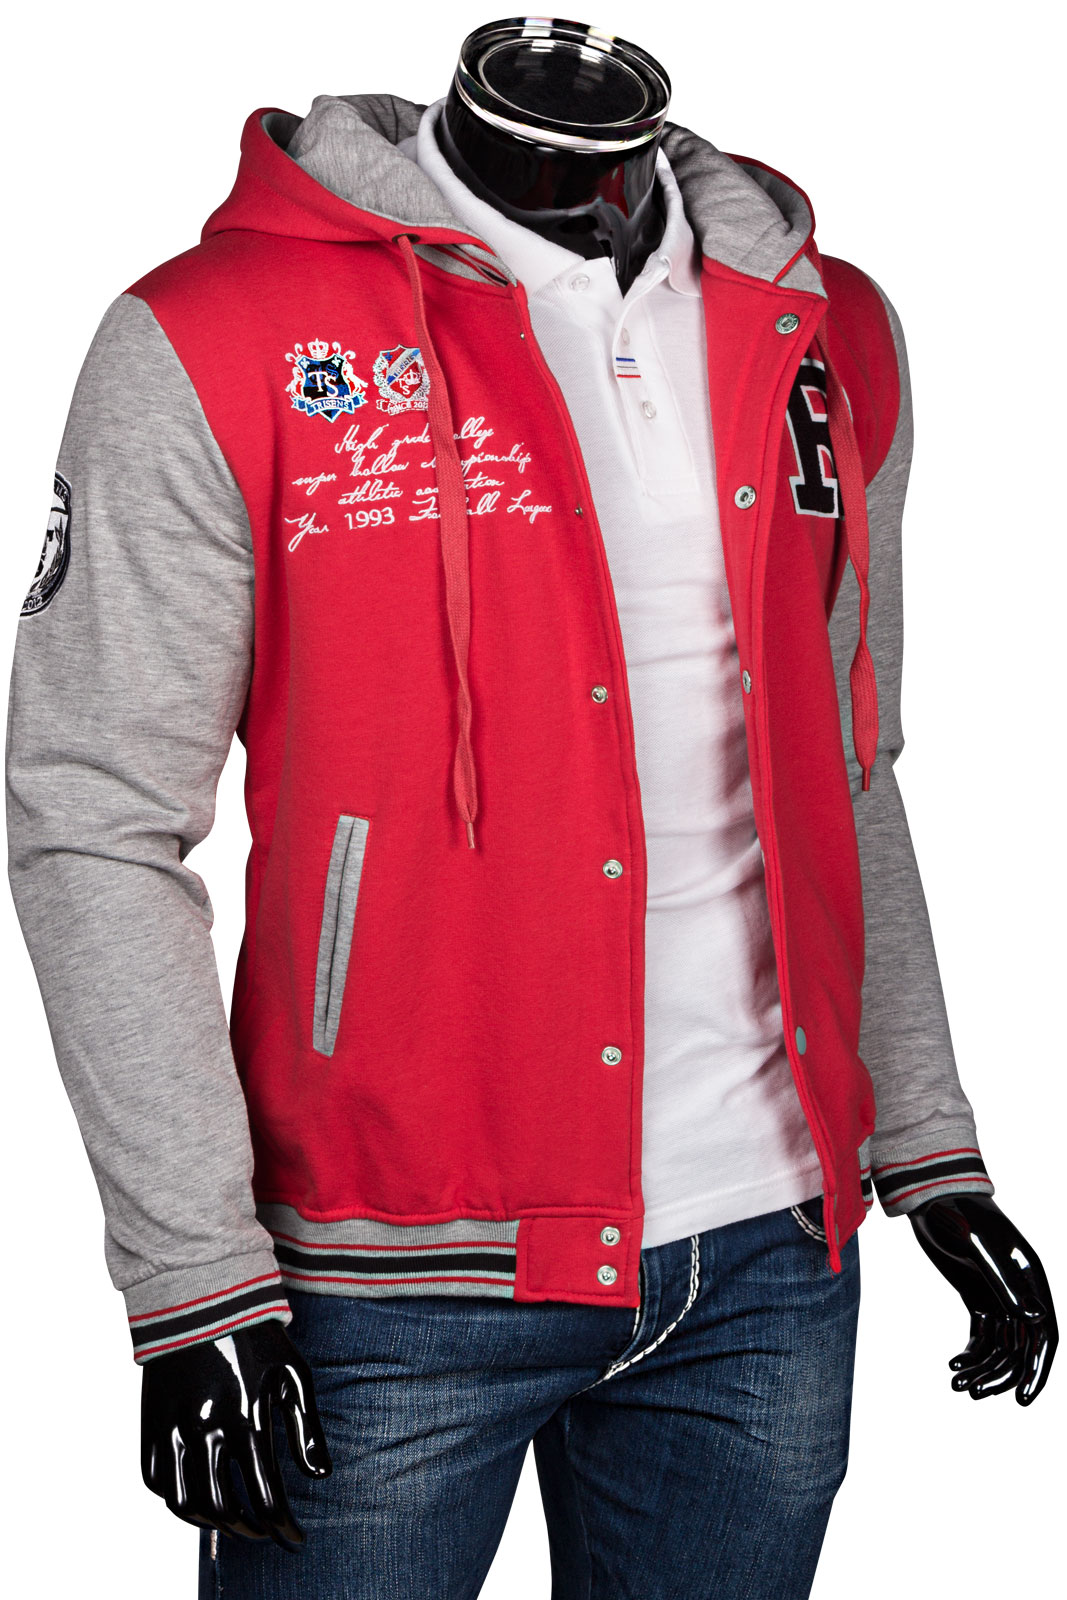 Trisens herren hoodie oldschool kapuzen college jacke sweatjacke baseball sport ebay - Rote college jacke ...